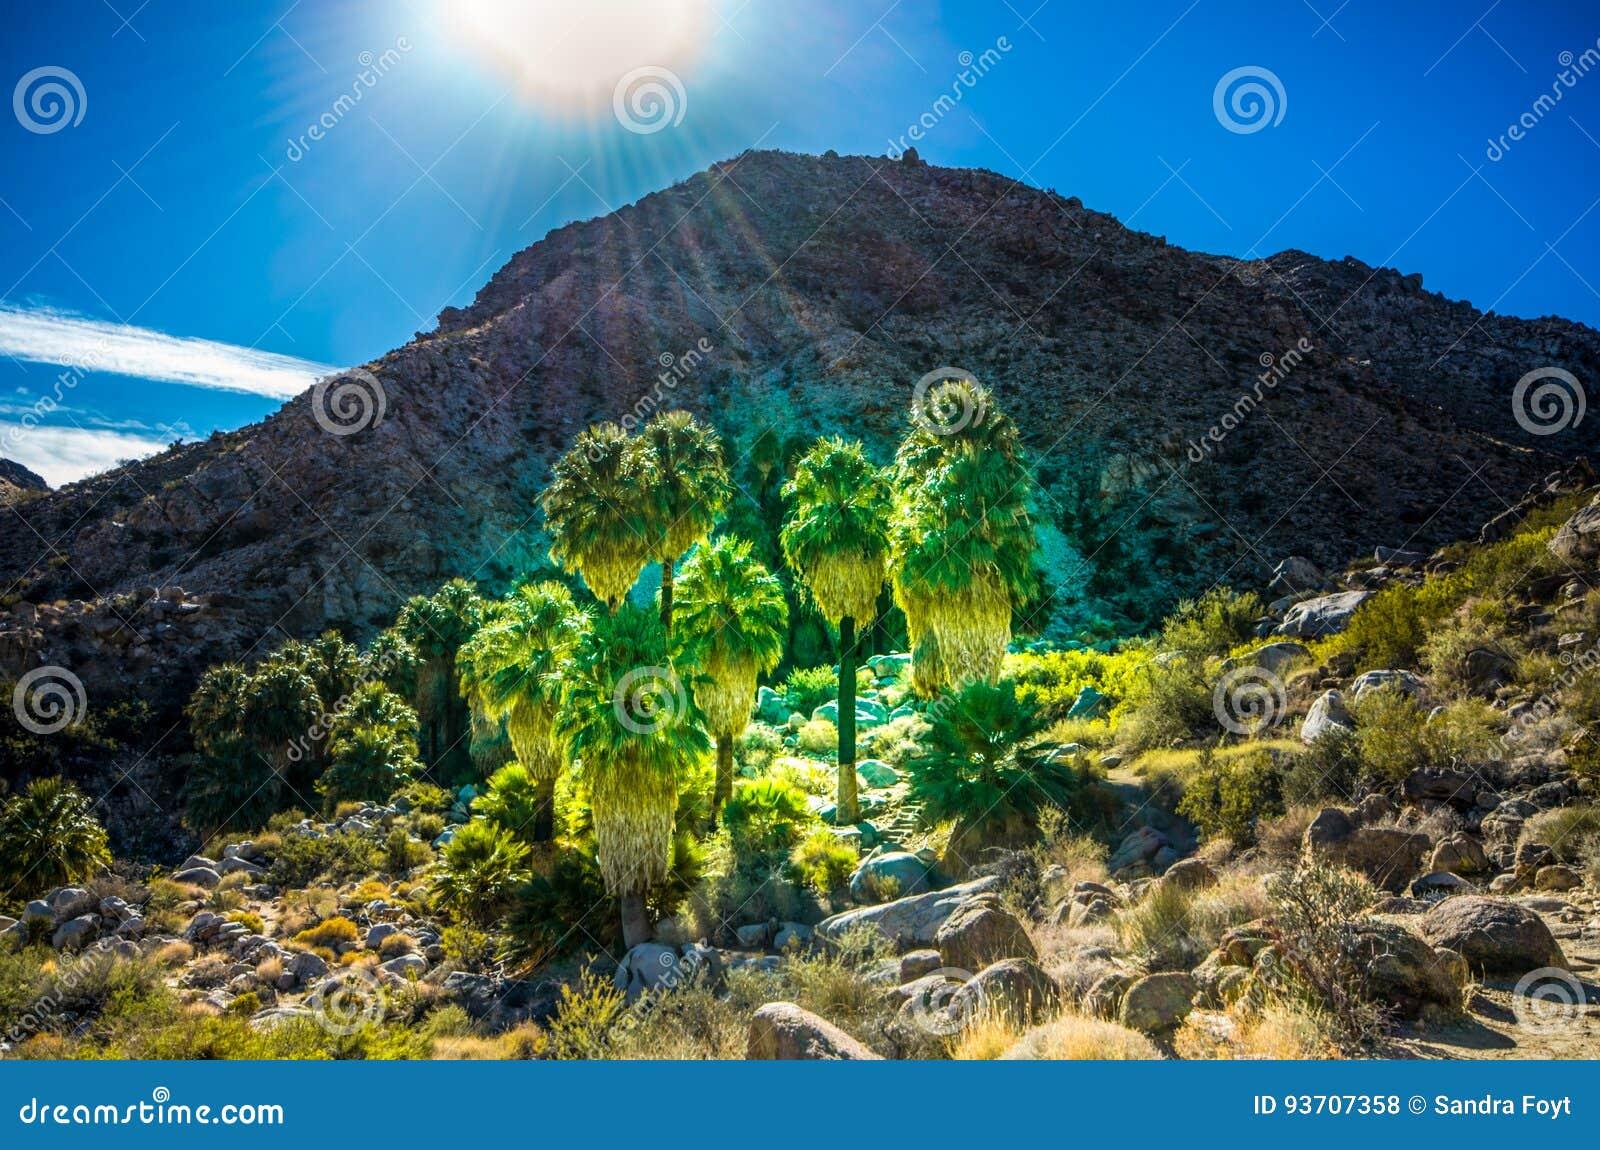 Oasis of Hope - Joshua Tree National Park - California